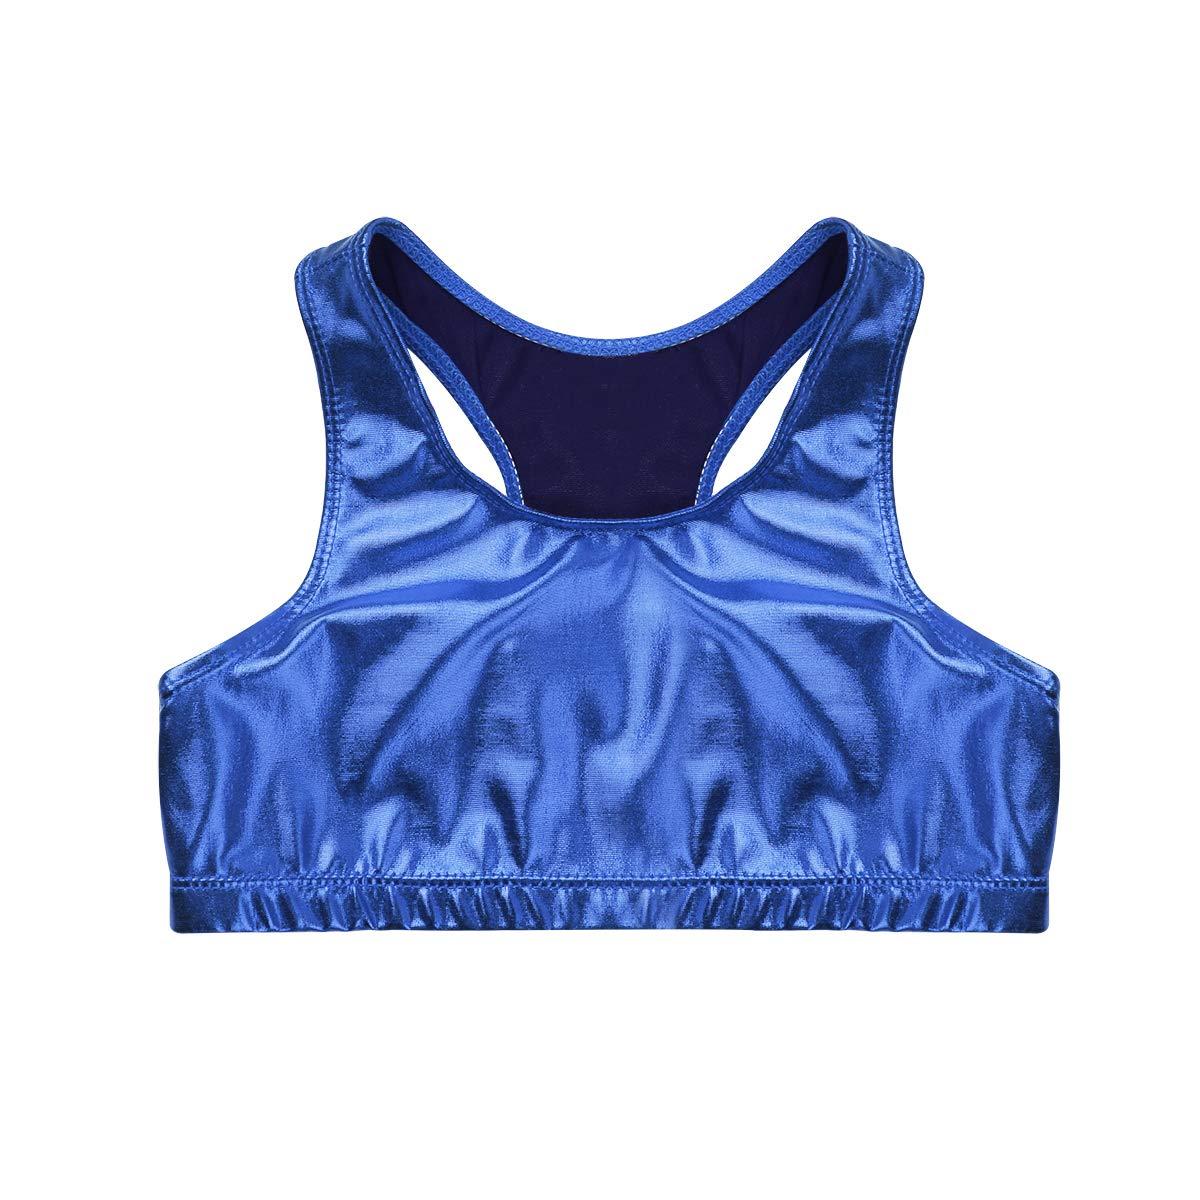 agoky Girls Shiny Sleeveless Racer Back Crop Top Sports Bra Dance Workout Short Vest